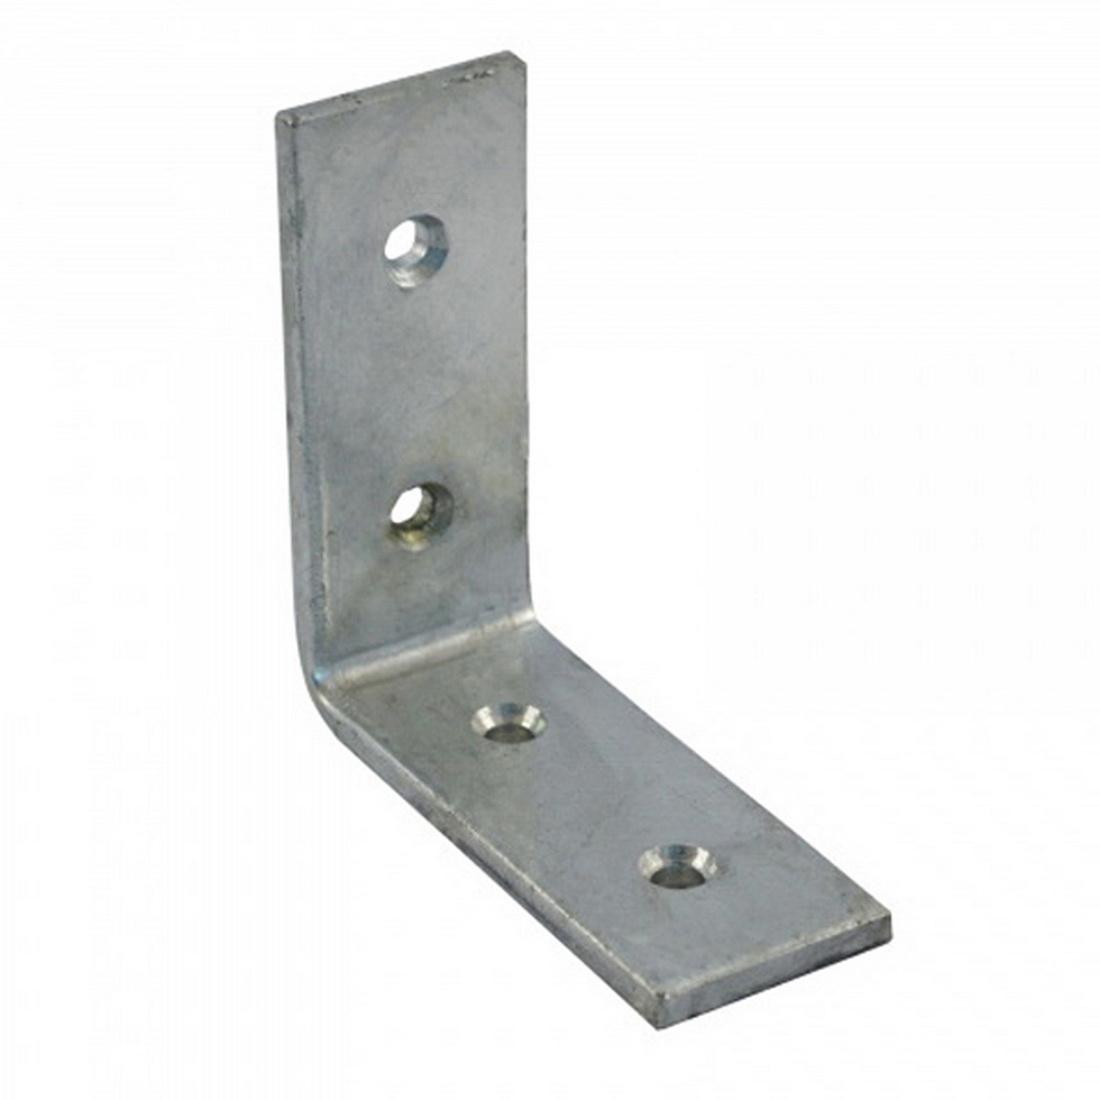 Heavy Duty Angle Bracket 75 x 75 x 40mm Zinc Plated BANHZ075E040R